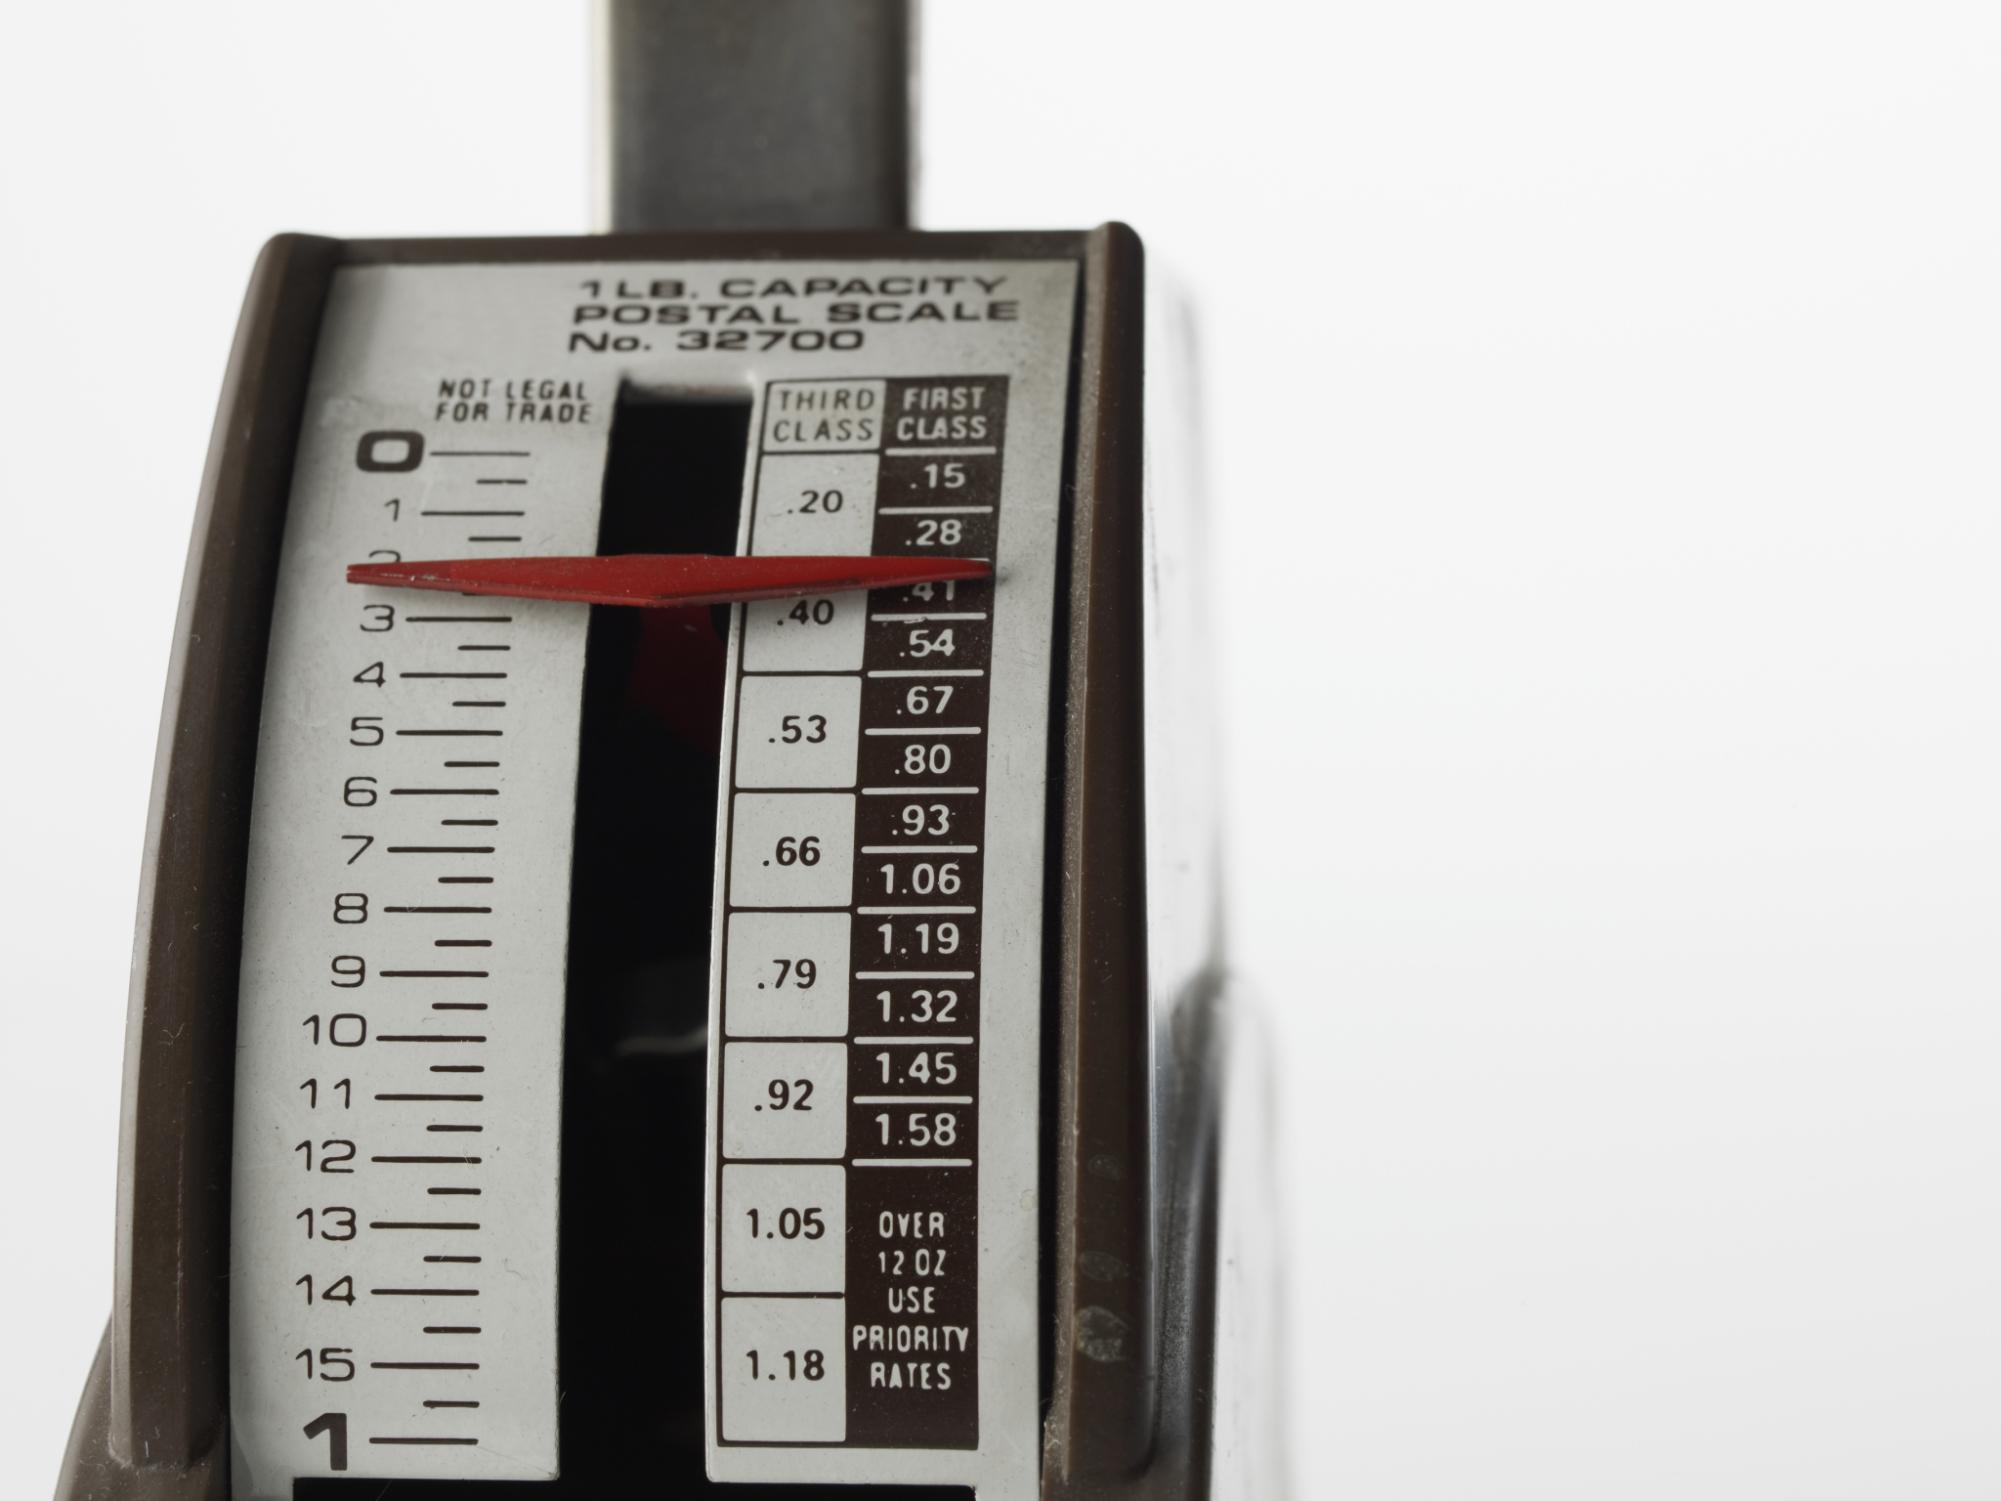 How to Reset Digital Scales | Bizfluent